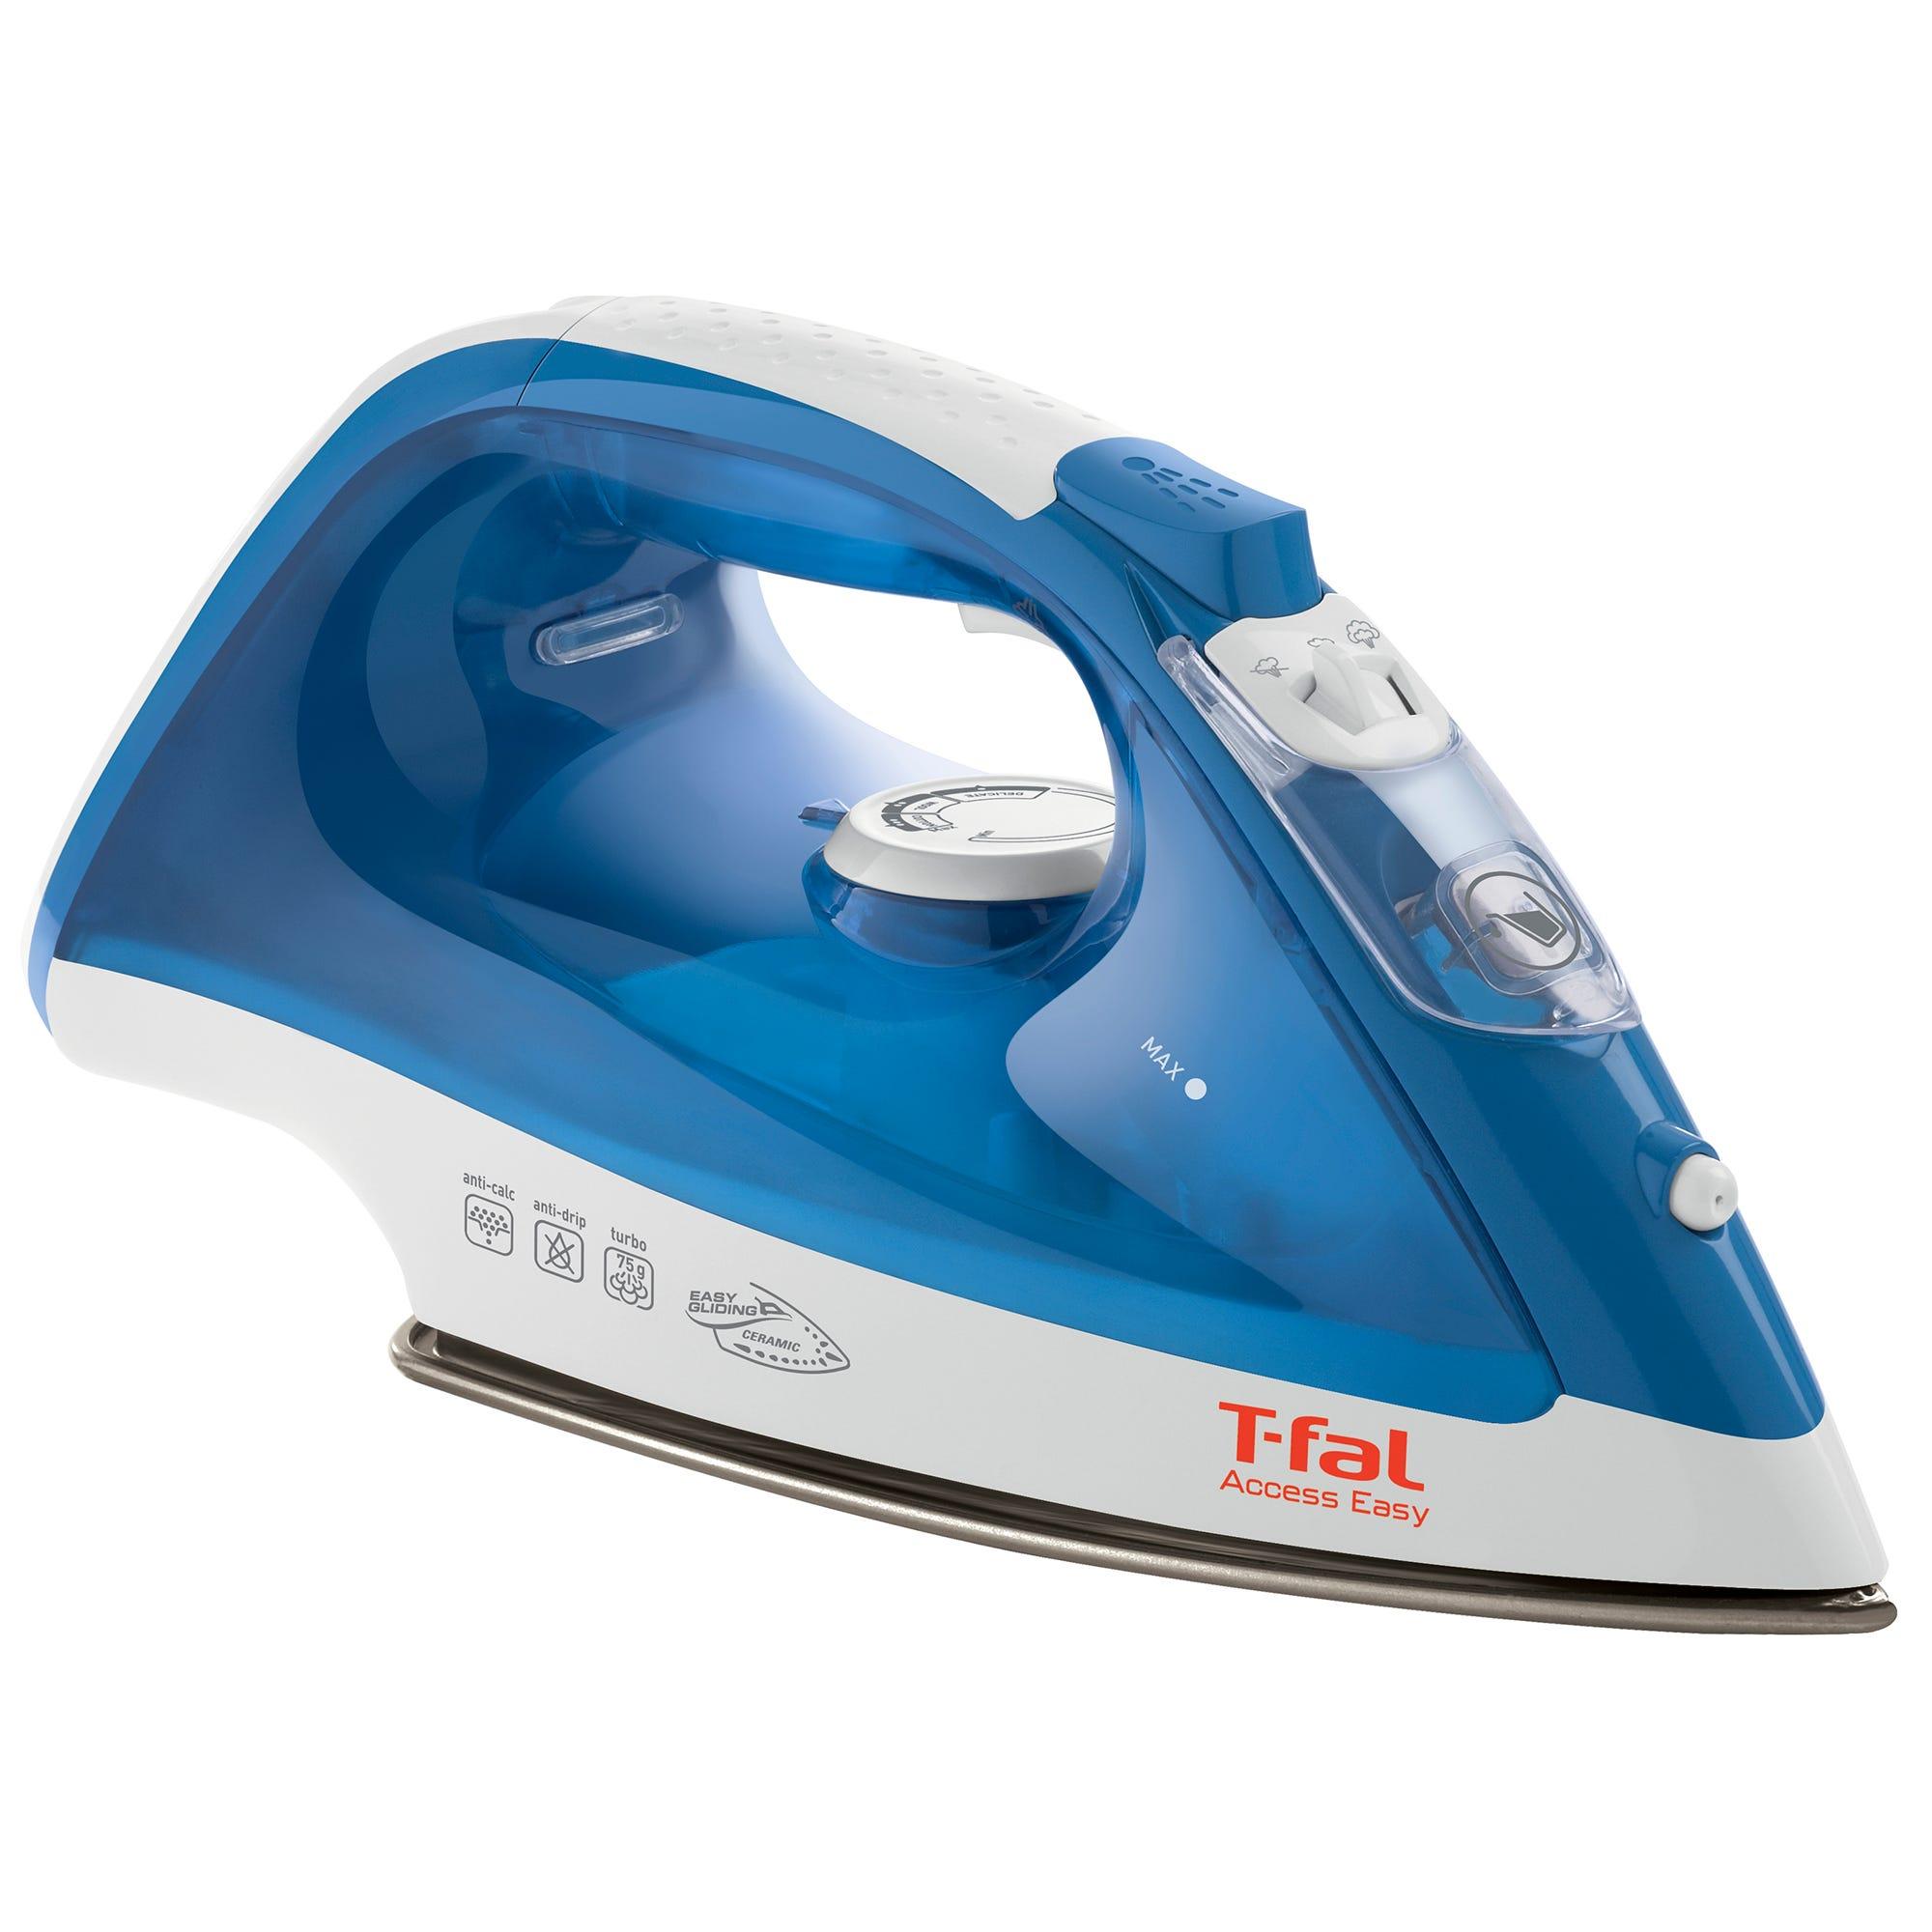 T-fal® Access Easy Plancha en azul